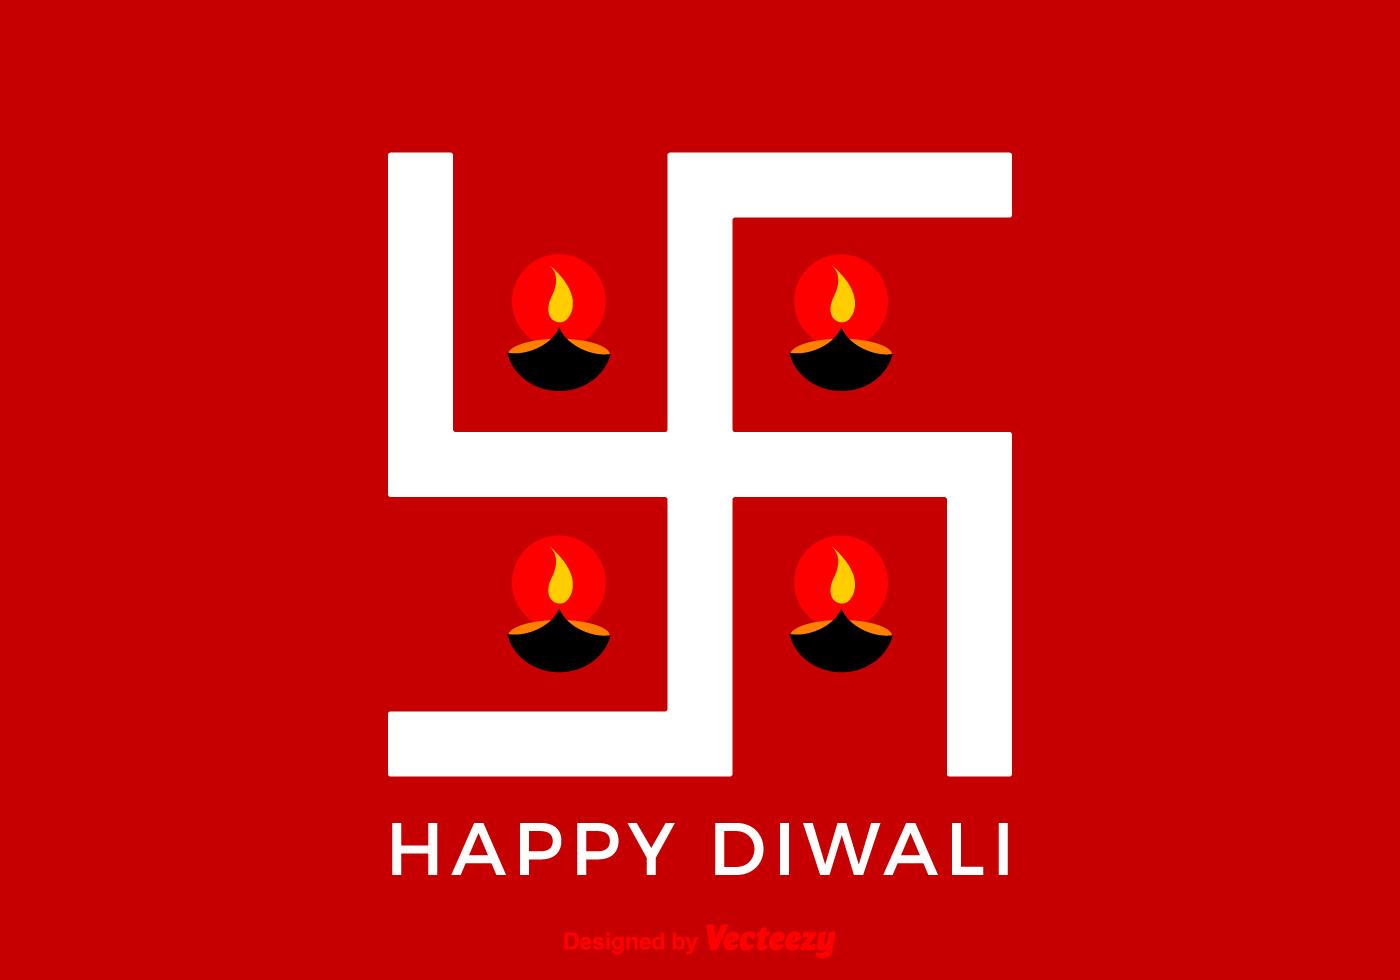 Free Vector Happy Diwali Swastika Download Free Vector Art Stock